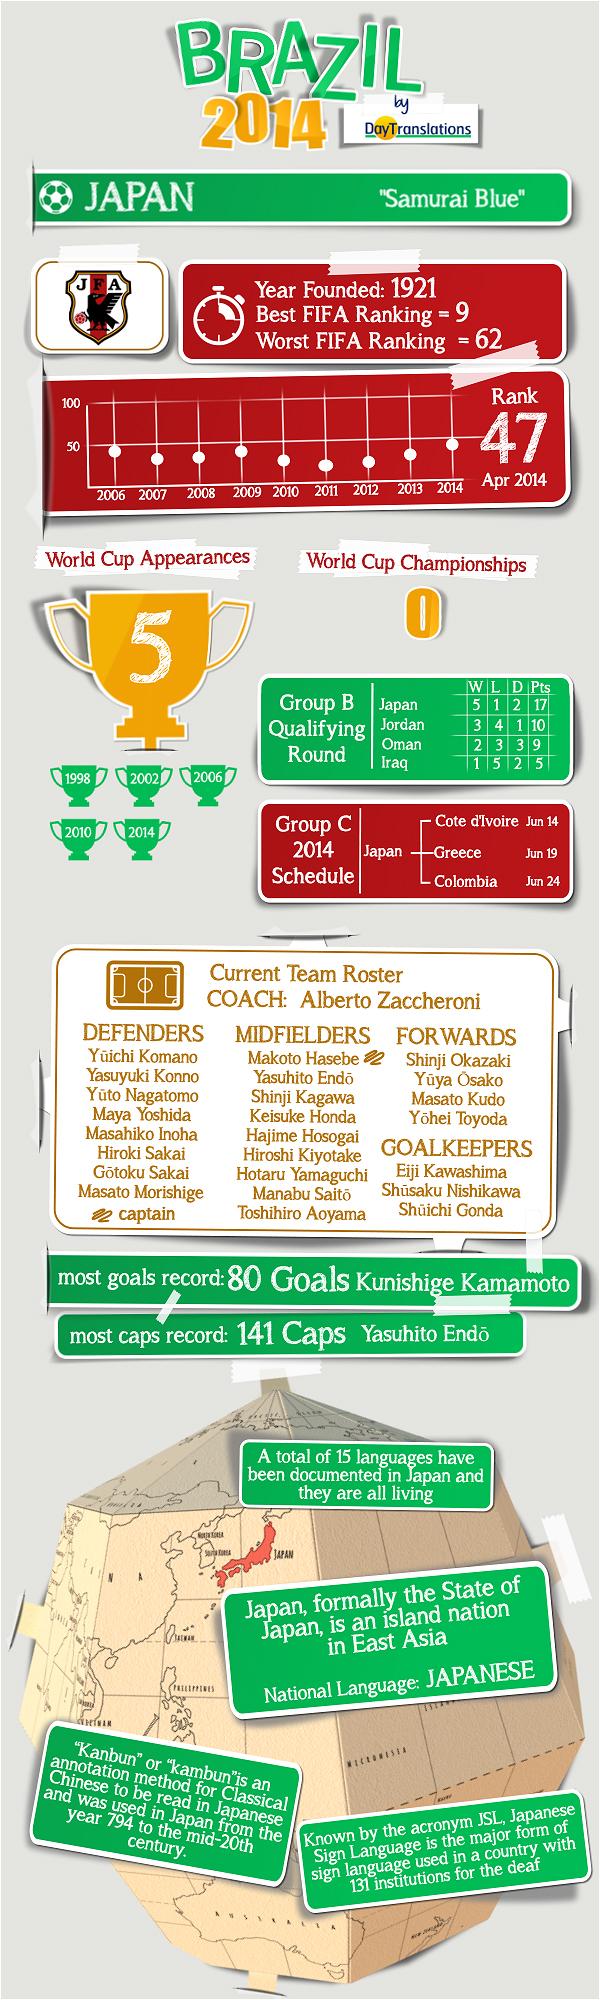 Day Translations' Infographics - Japan